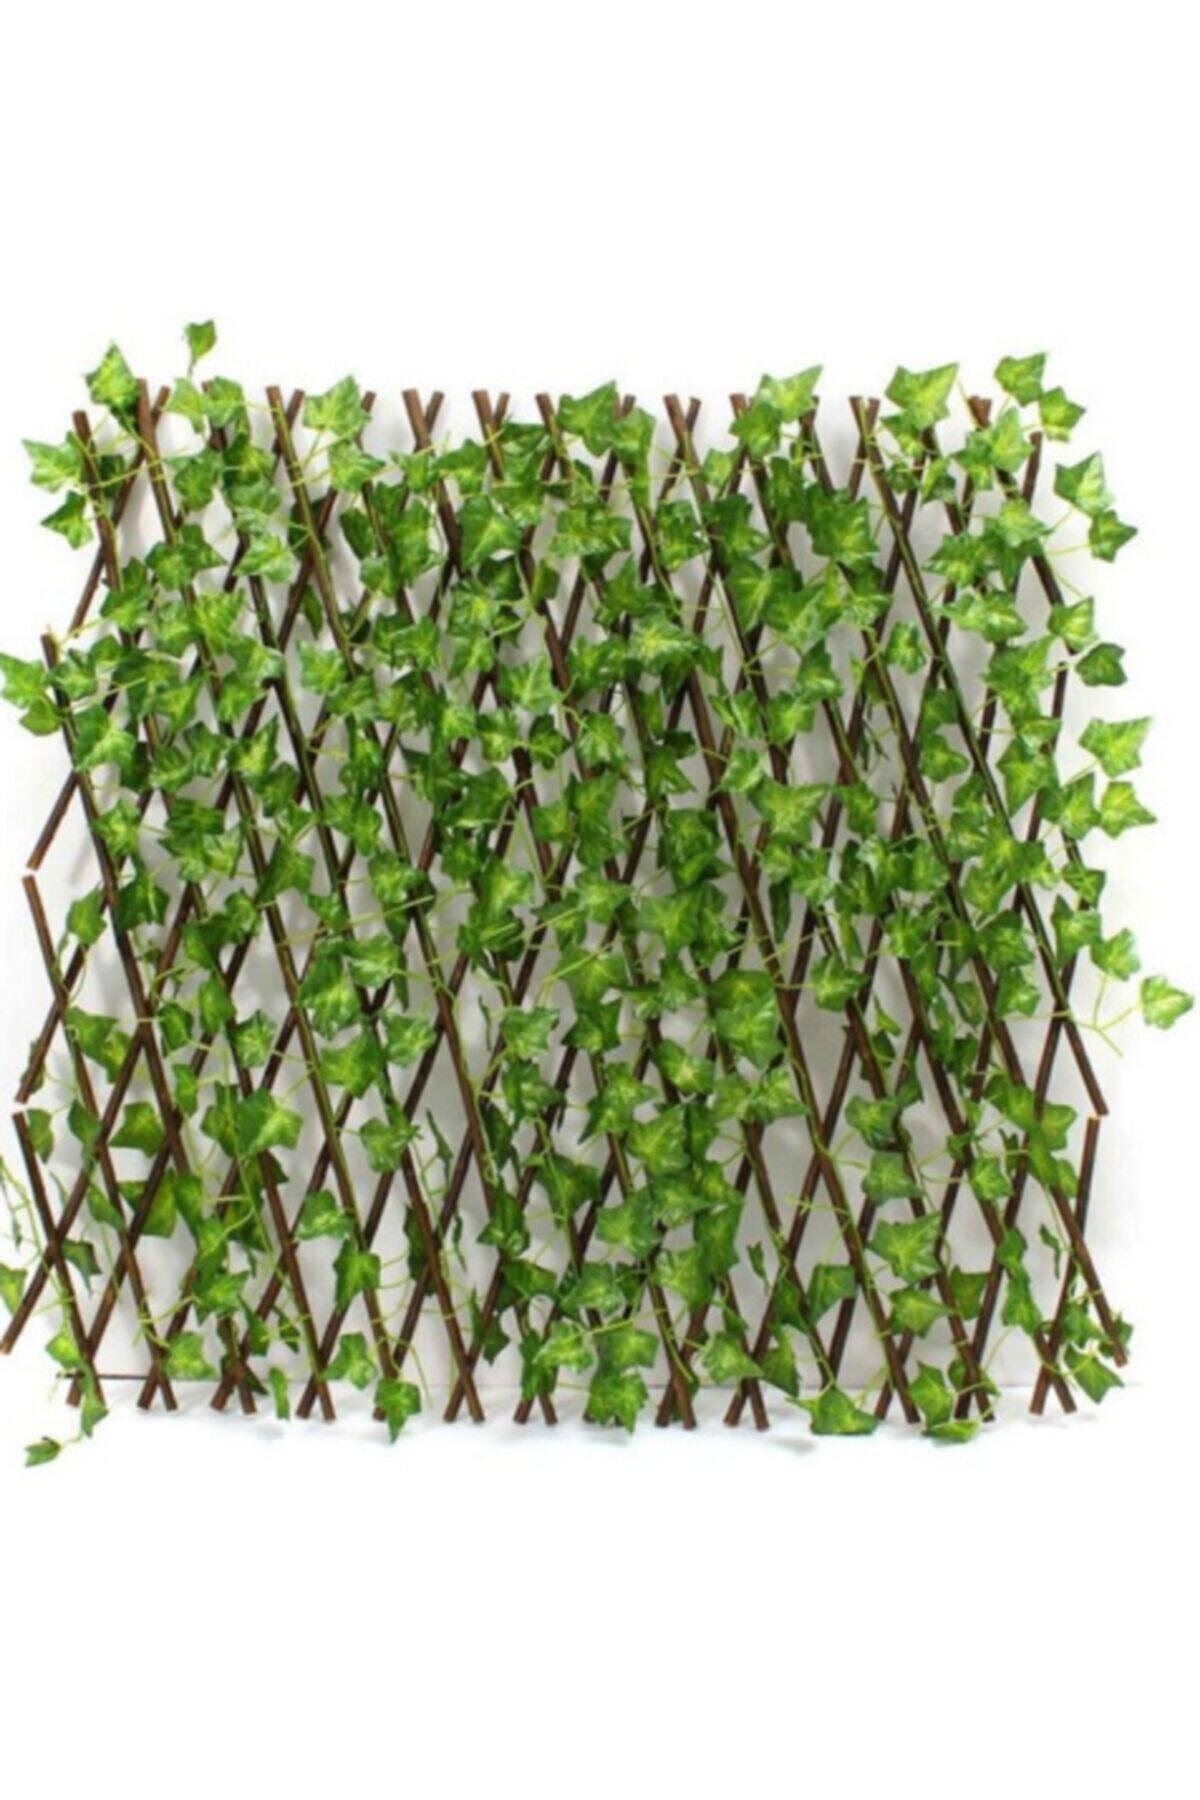 Yapay Sarmaşık Yaprak Çit Bahçe Balkon Çiti 3x1.2 M